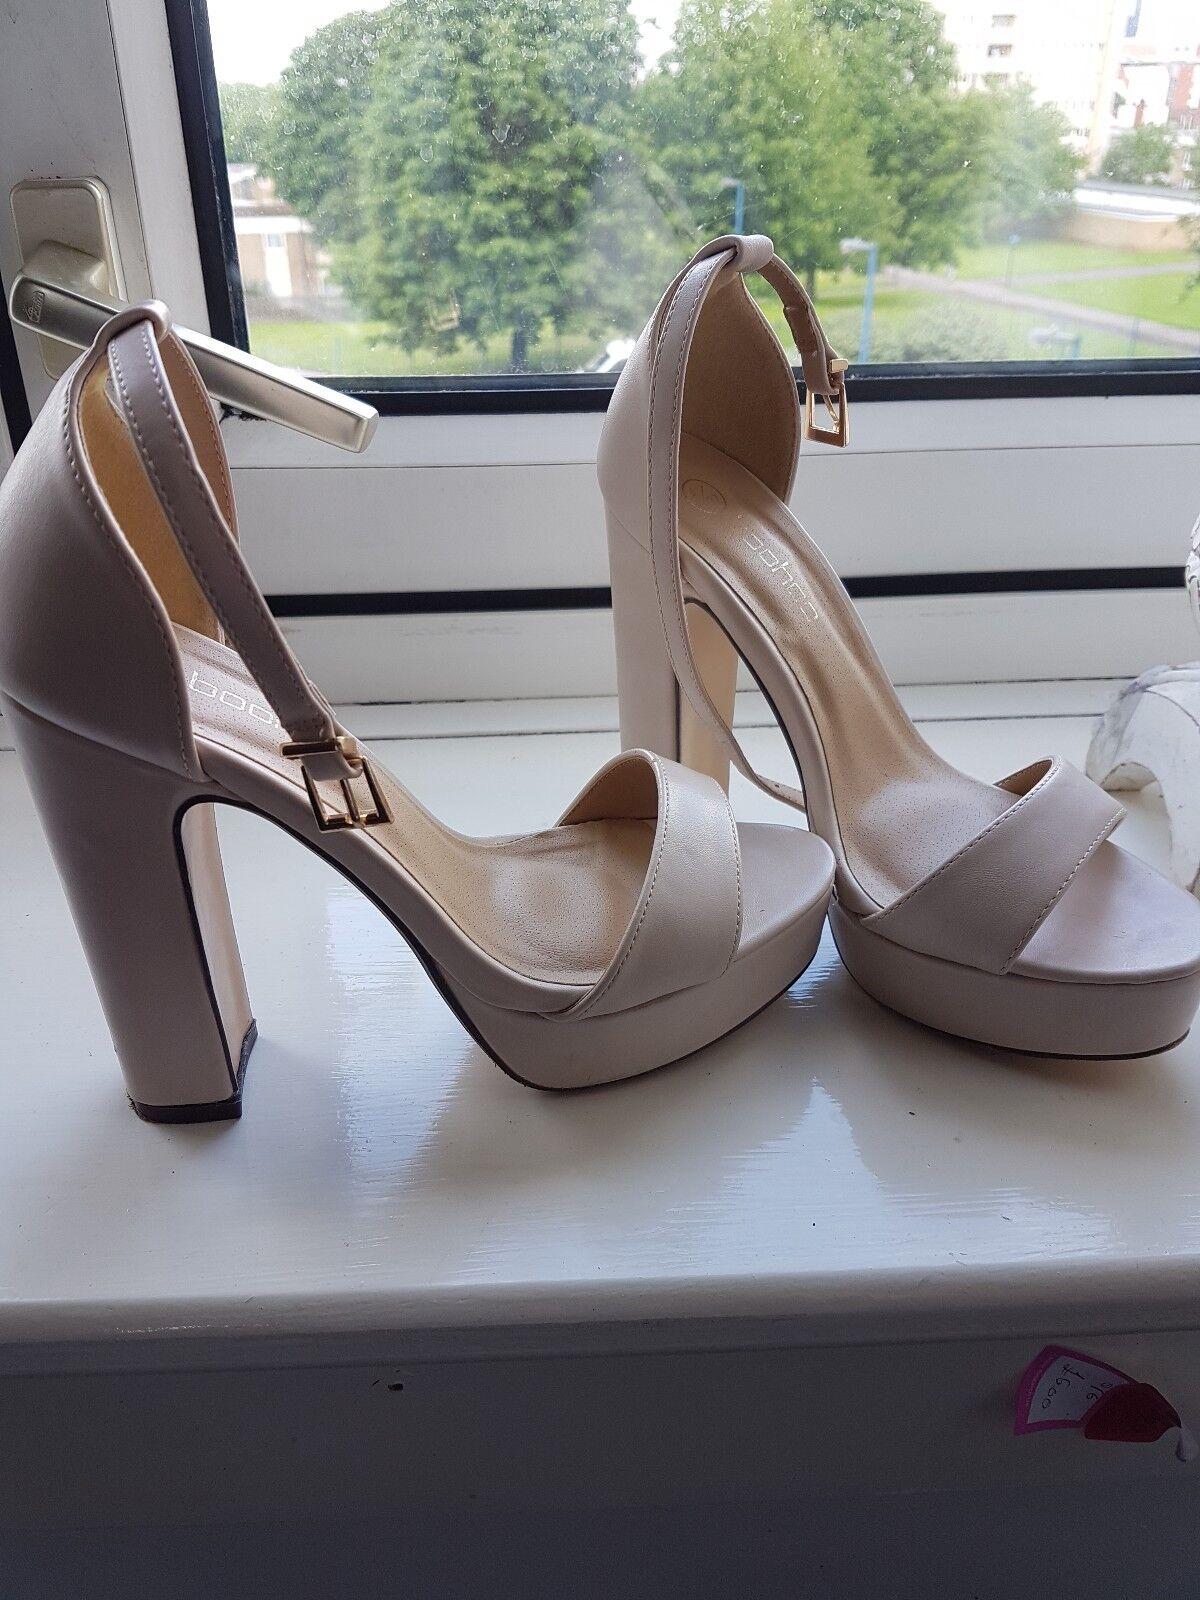 Boohoo ladies platform sandals Nude shoes open toes UK size 4